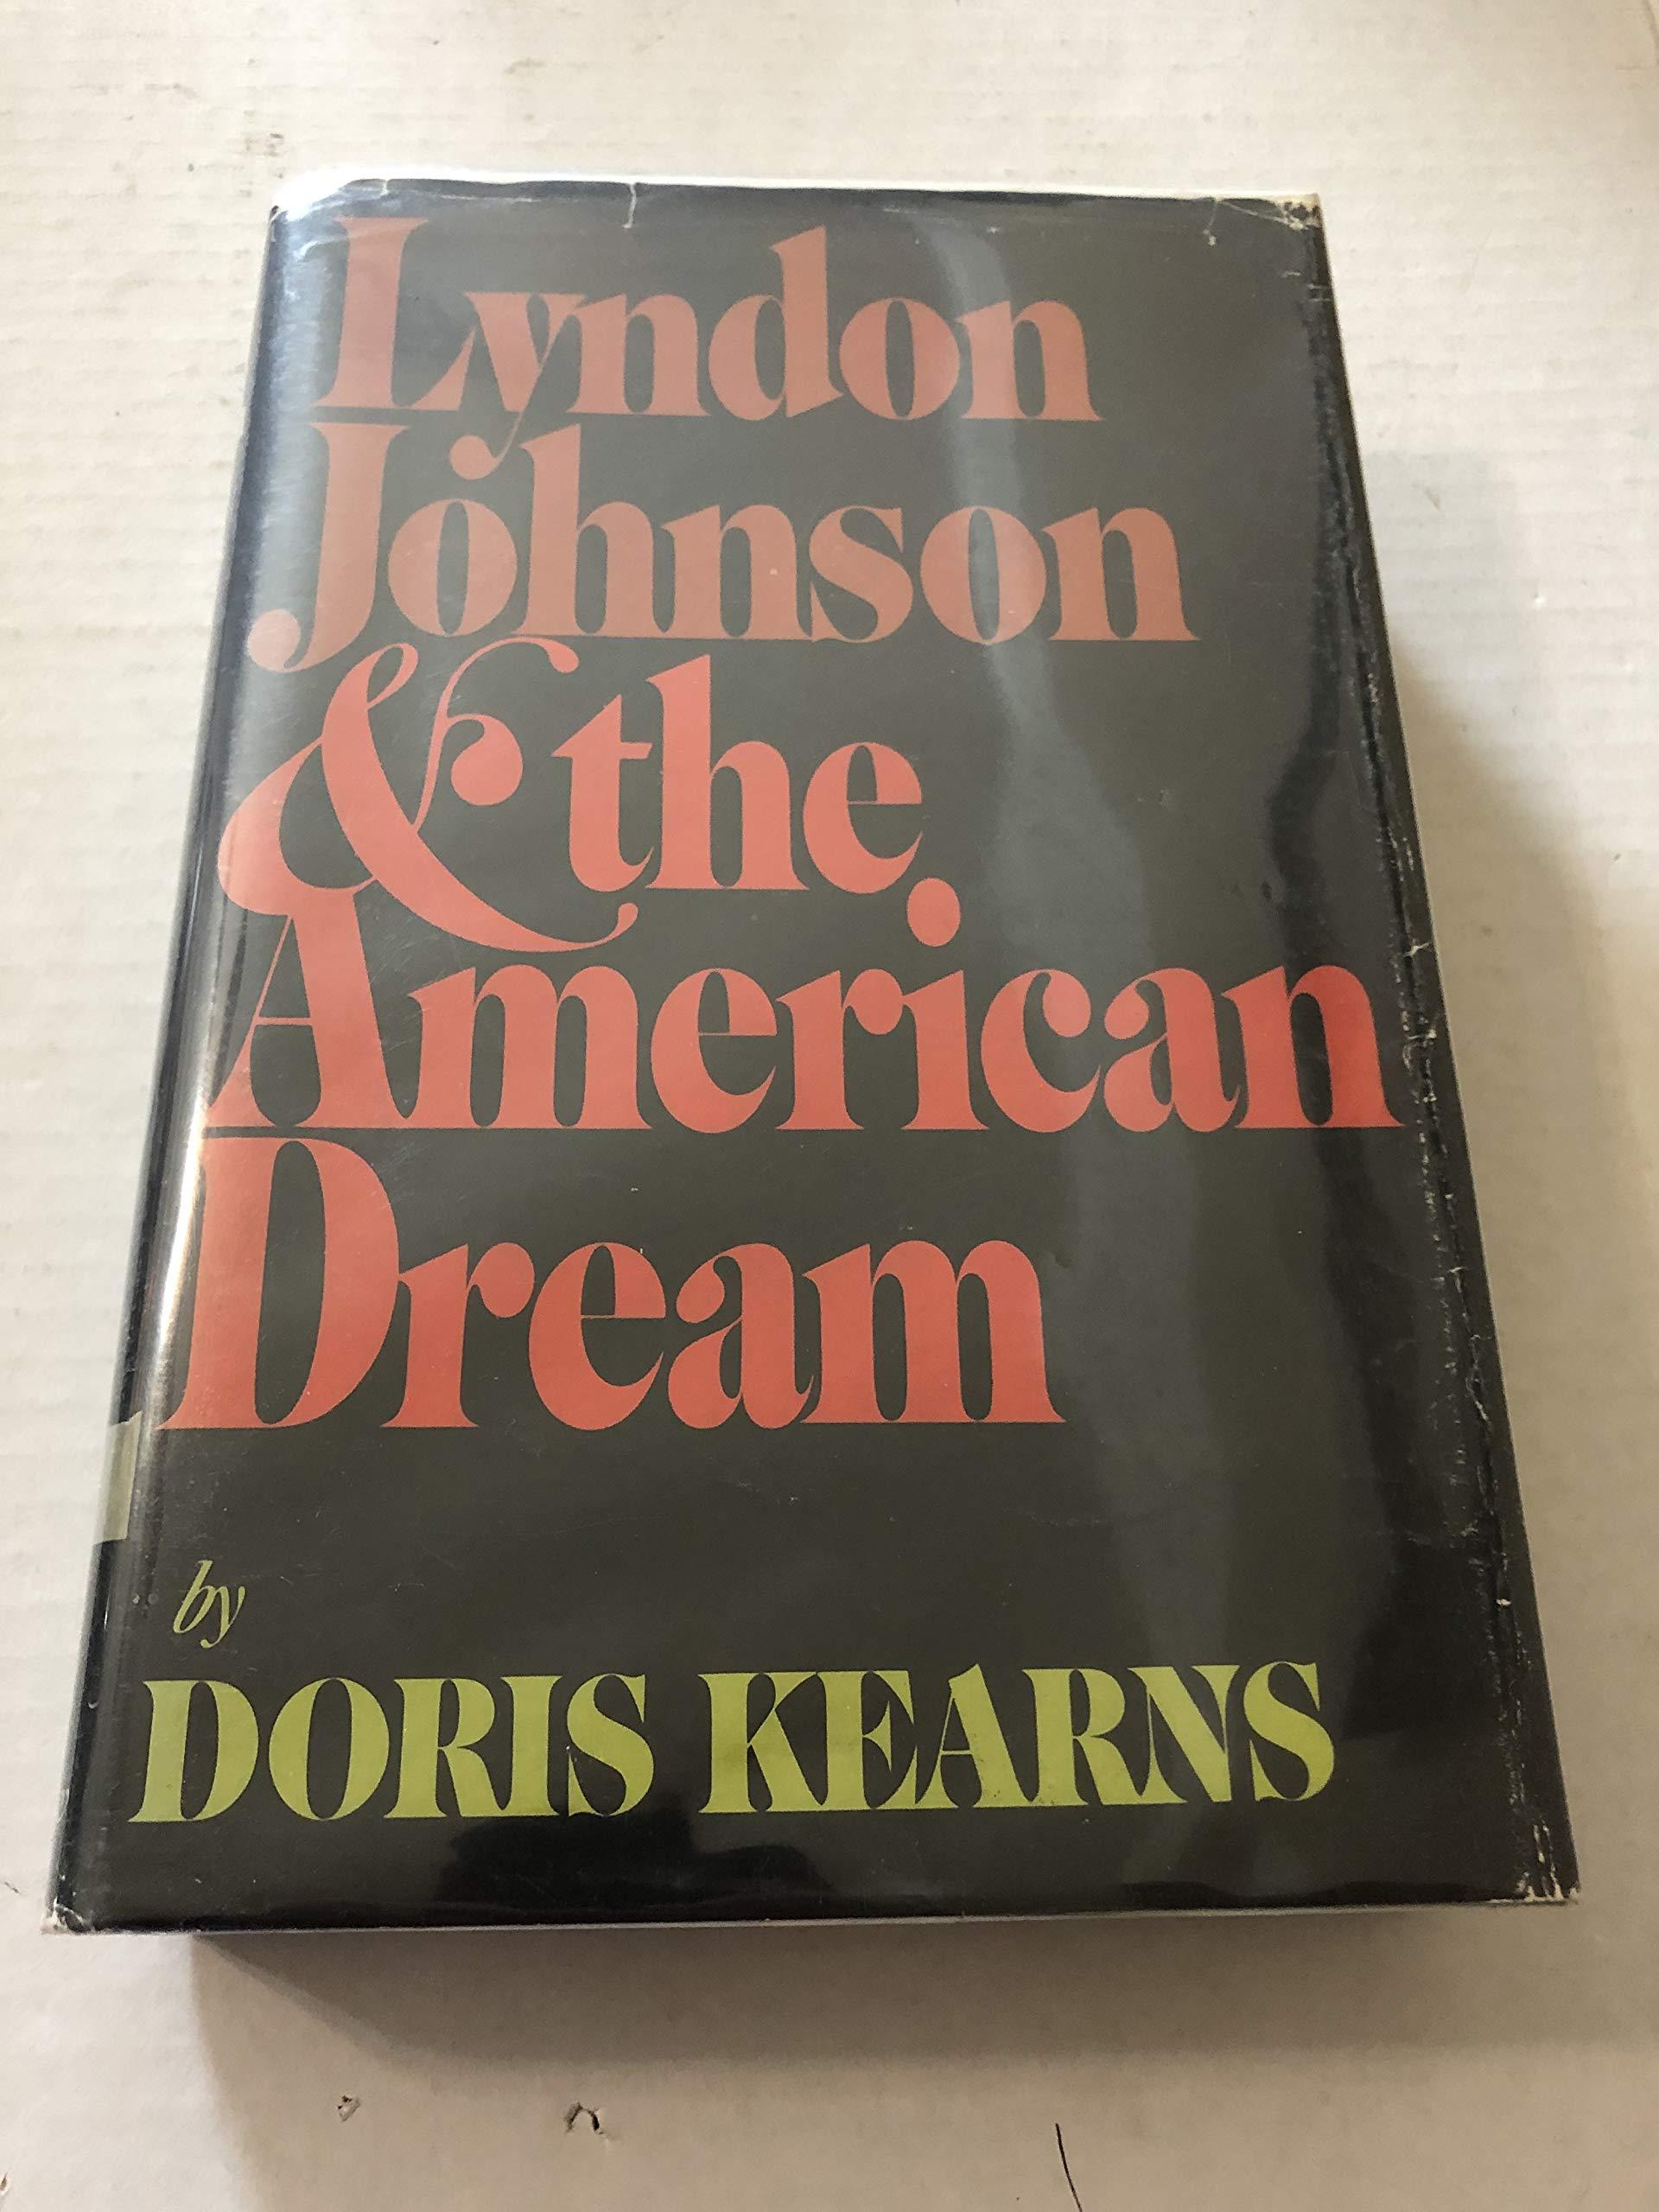 Lyndon Johnson and the American Dream: Amazon.es: Doris ...